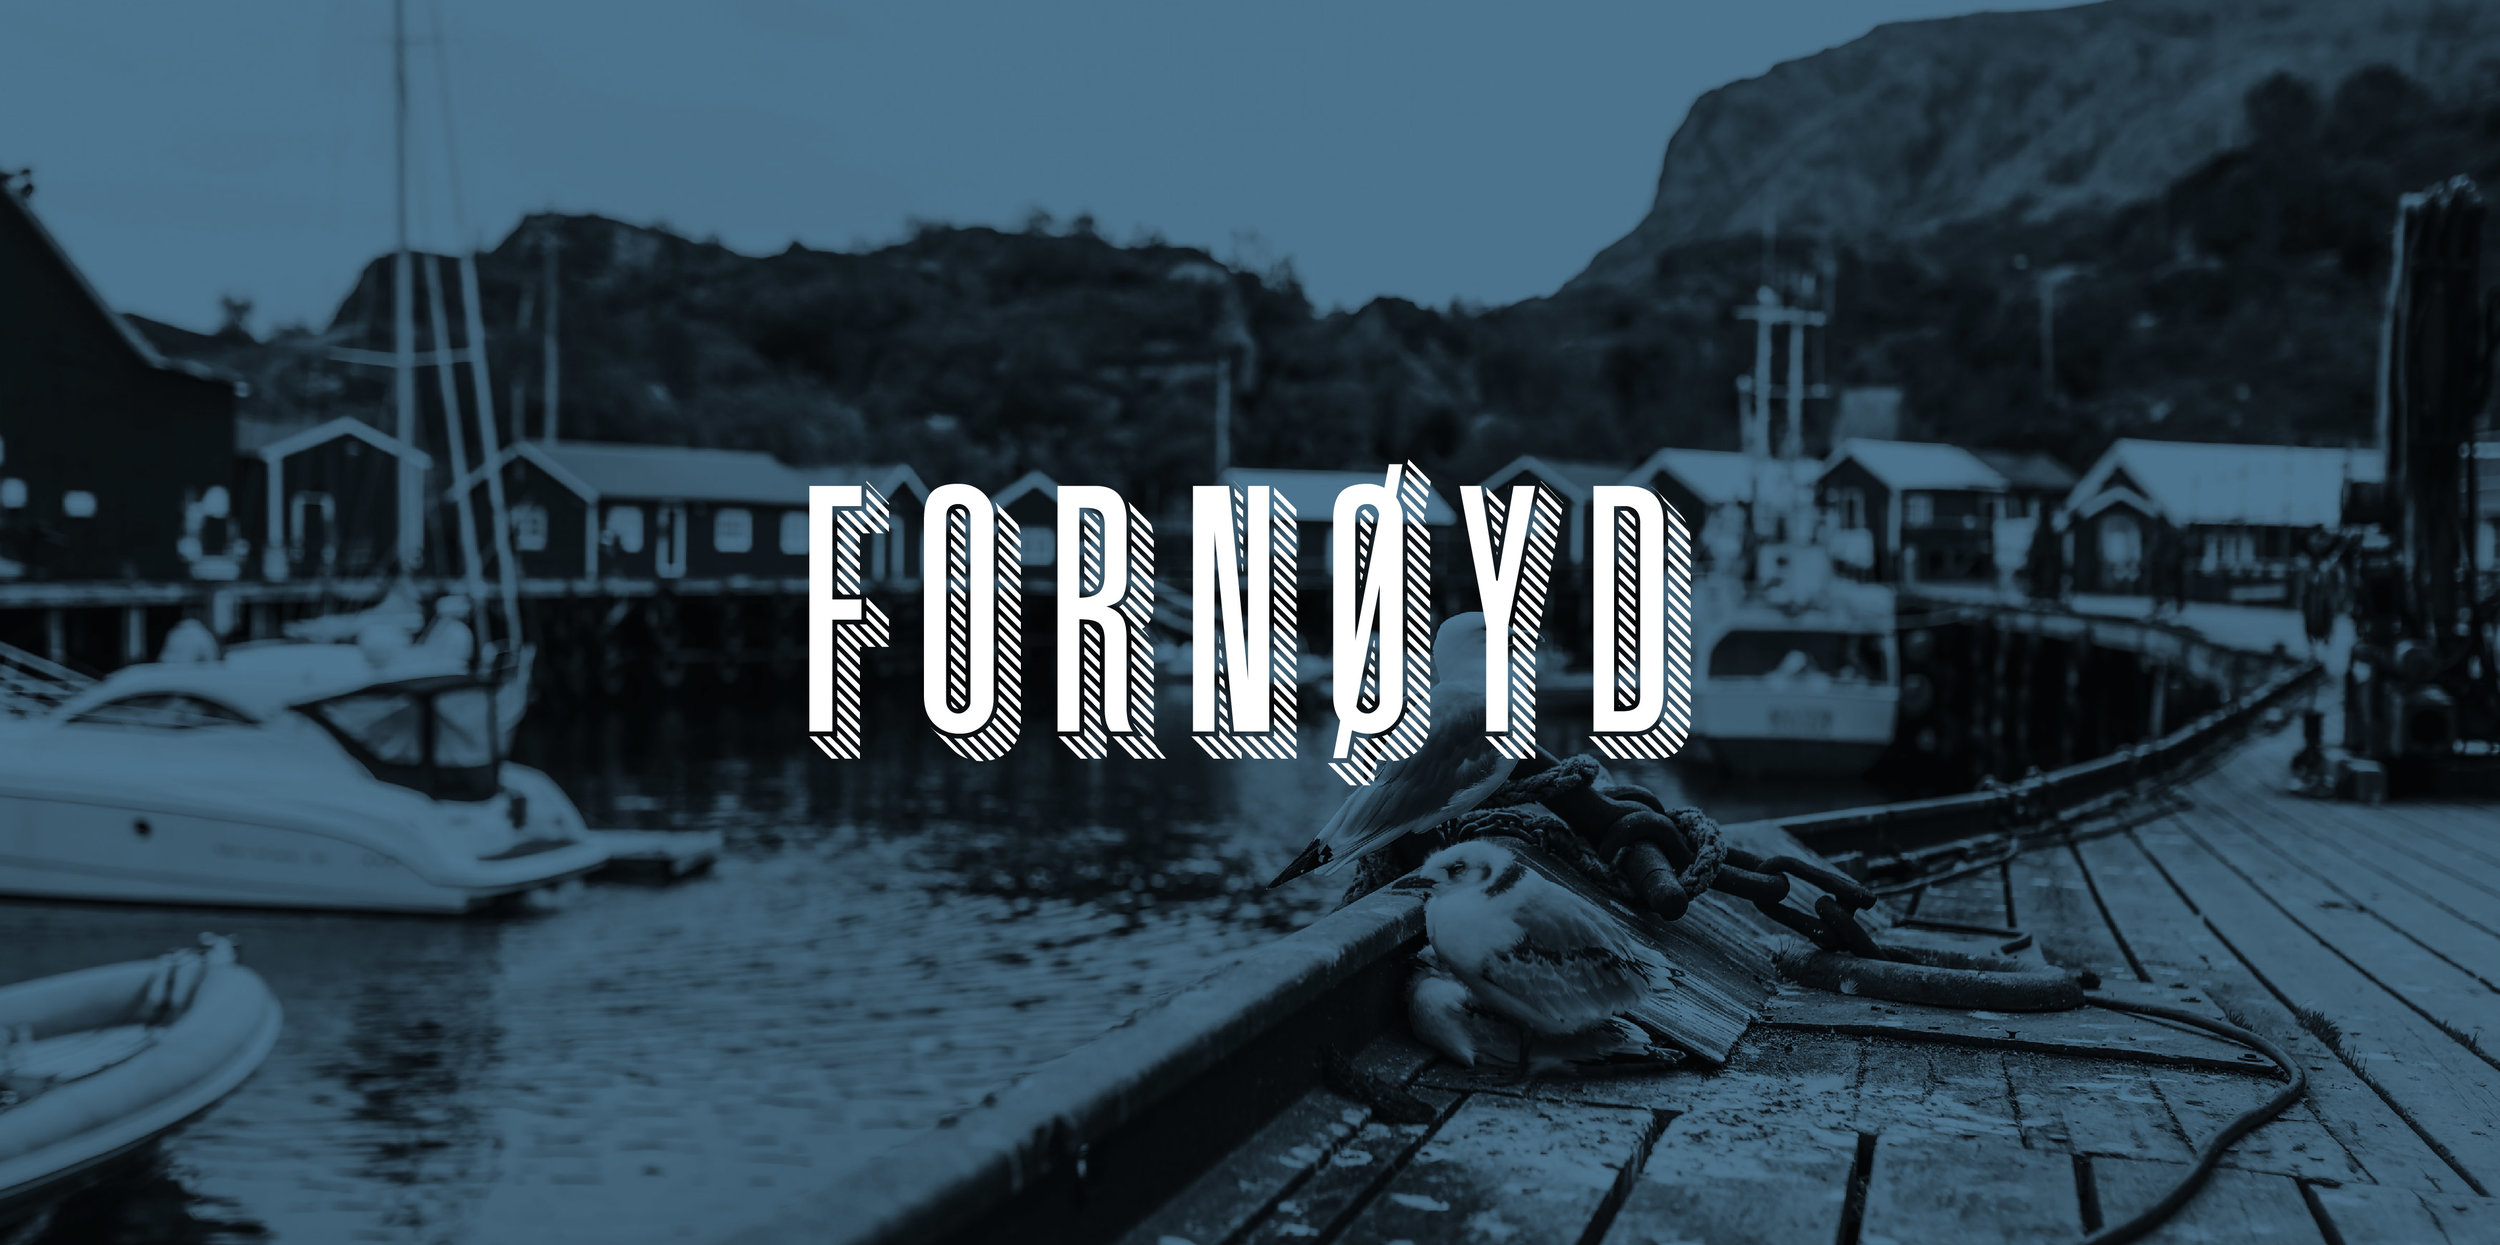 logo_photo_fornoyd-01.jpg